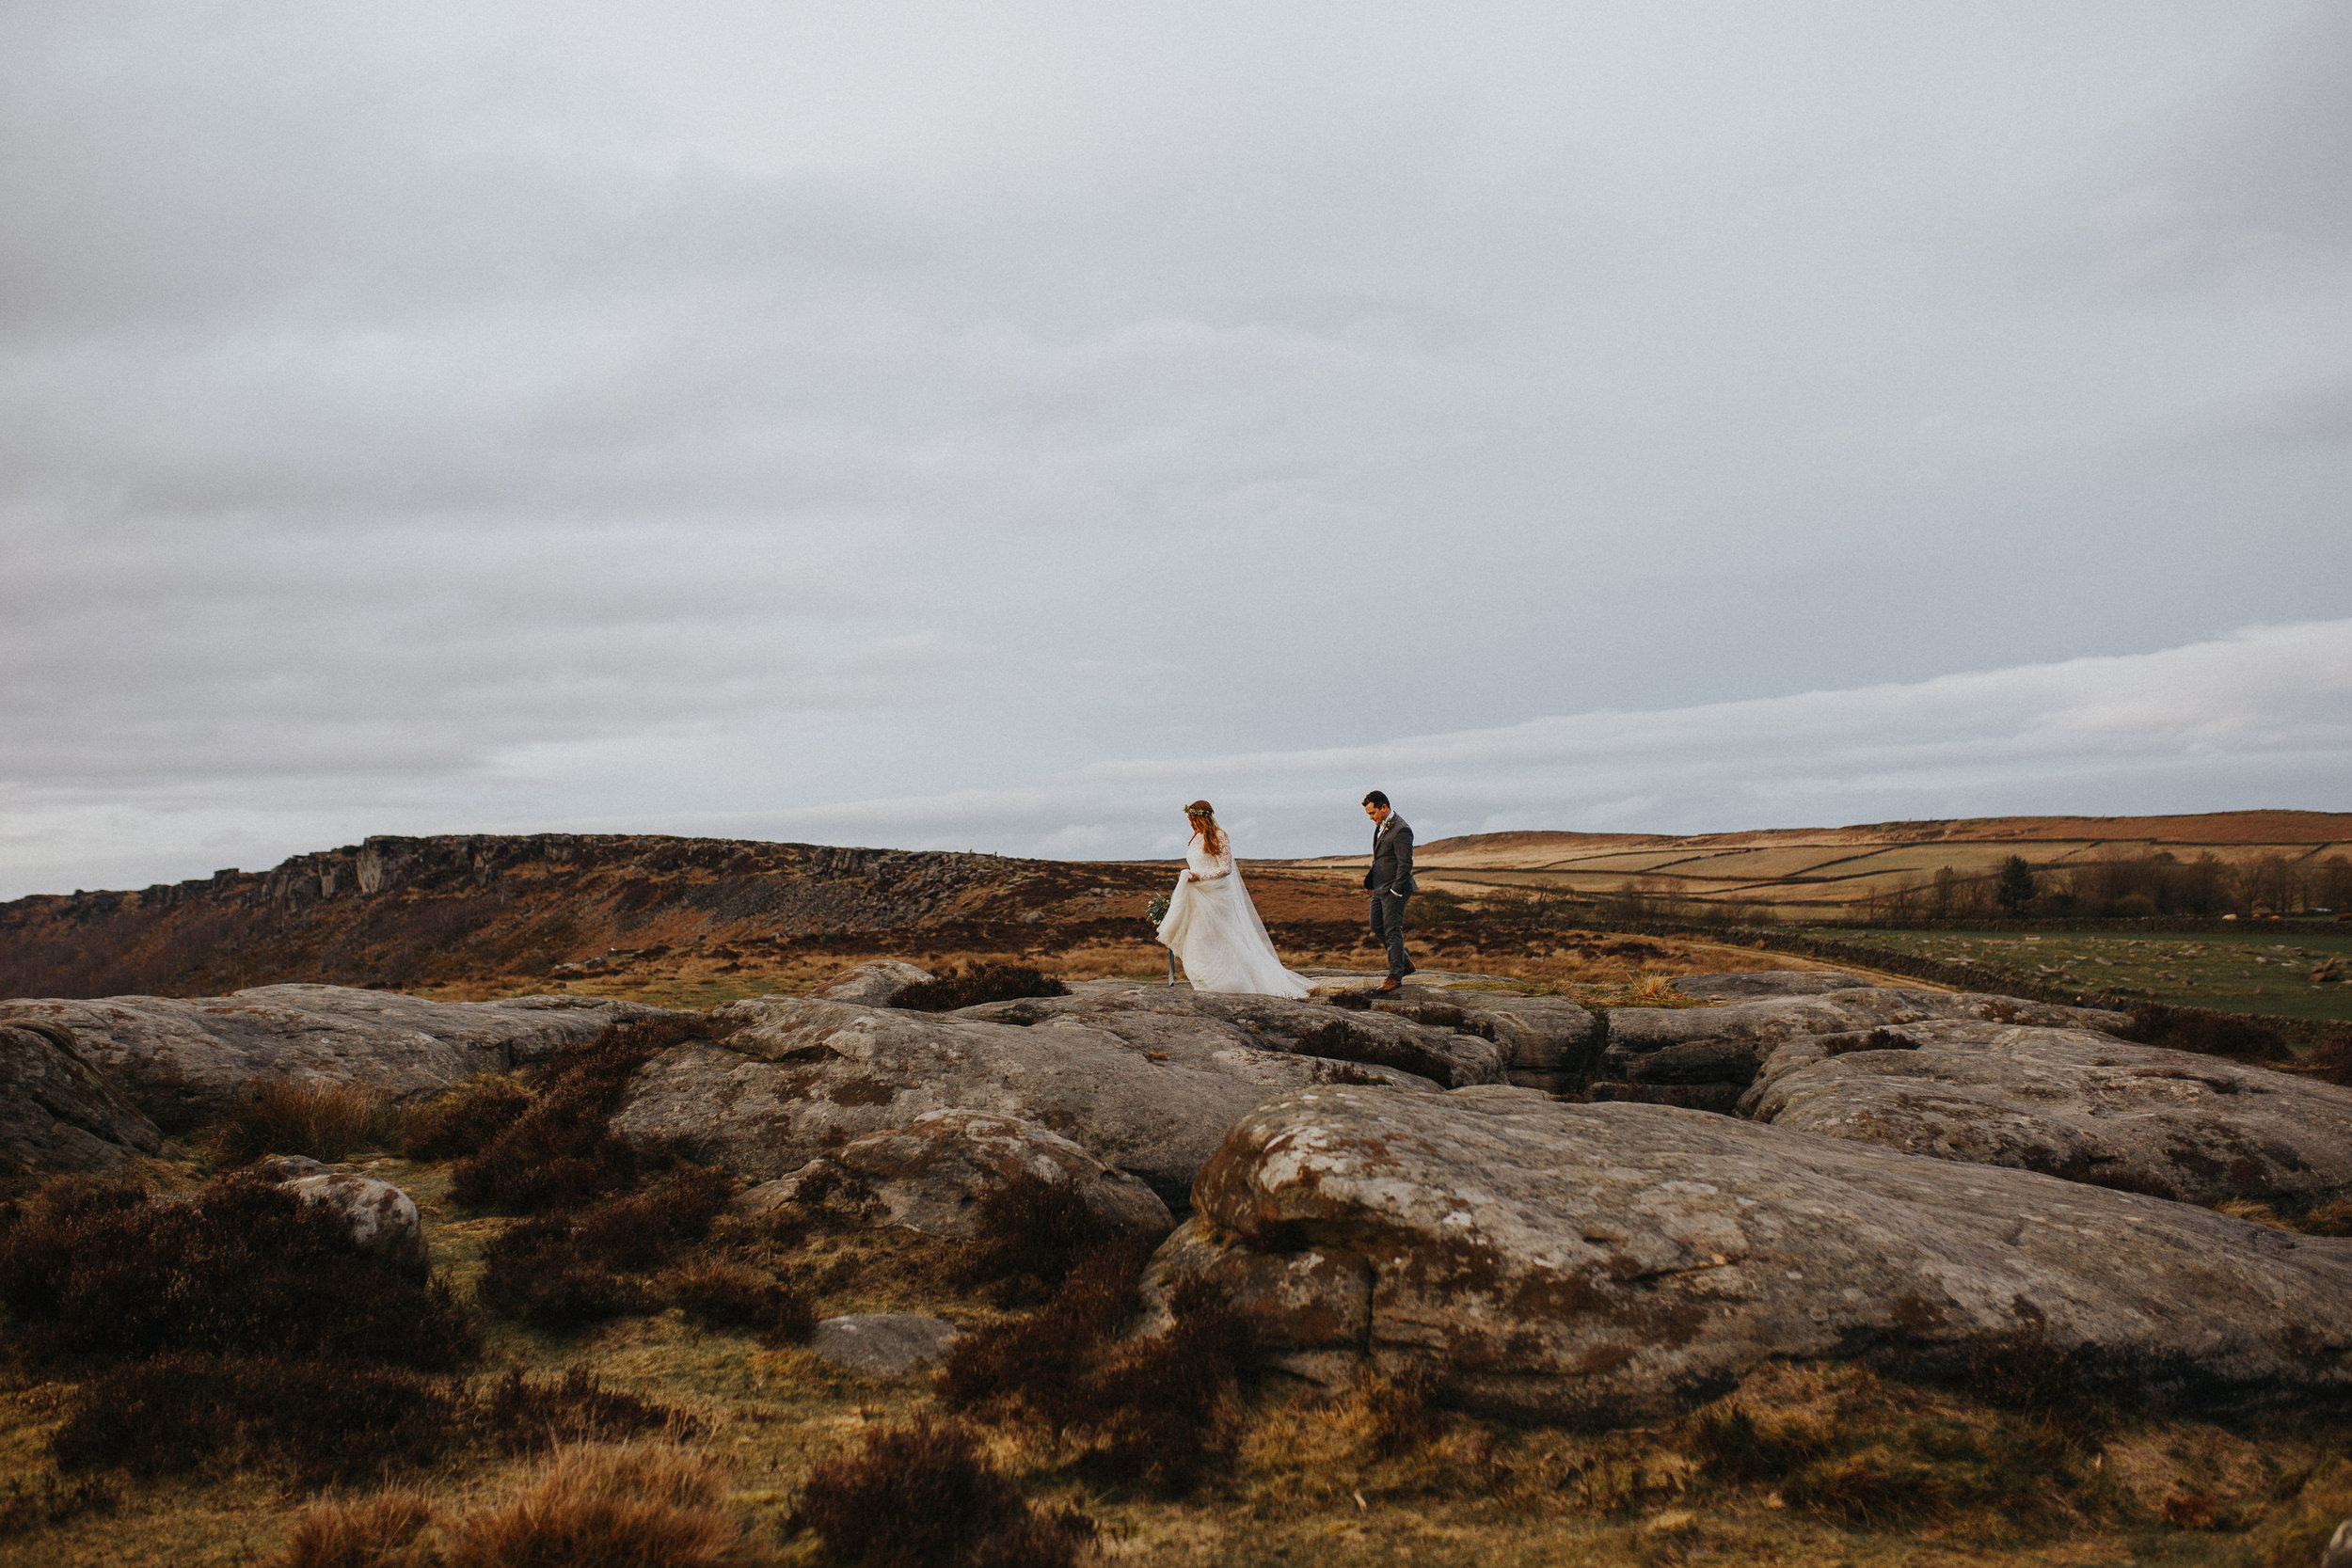 Rosie-bespoke-lace-long sleeved-tulle-wedding-dress-winter-peak district-susanna greening-15.jpg